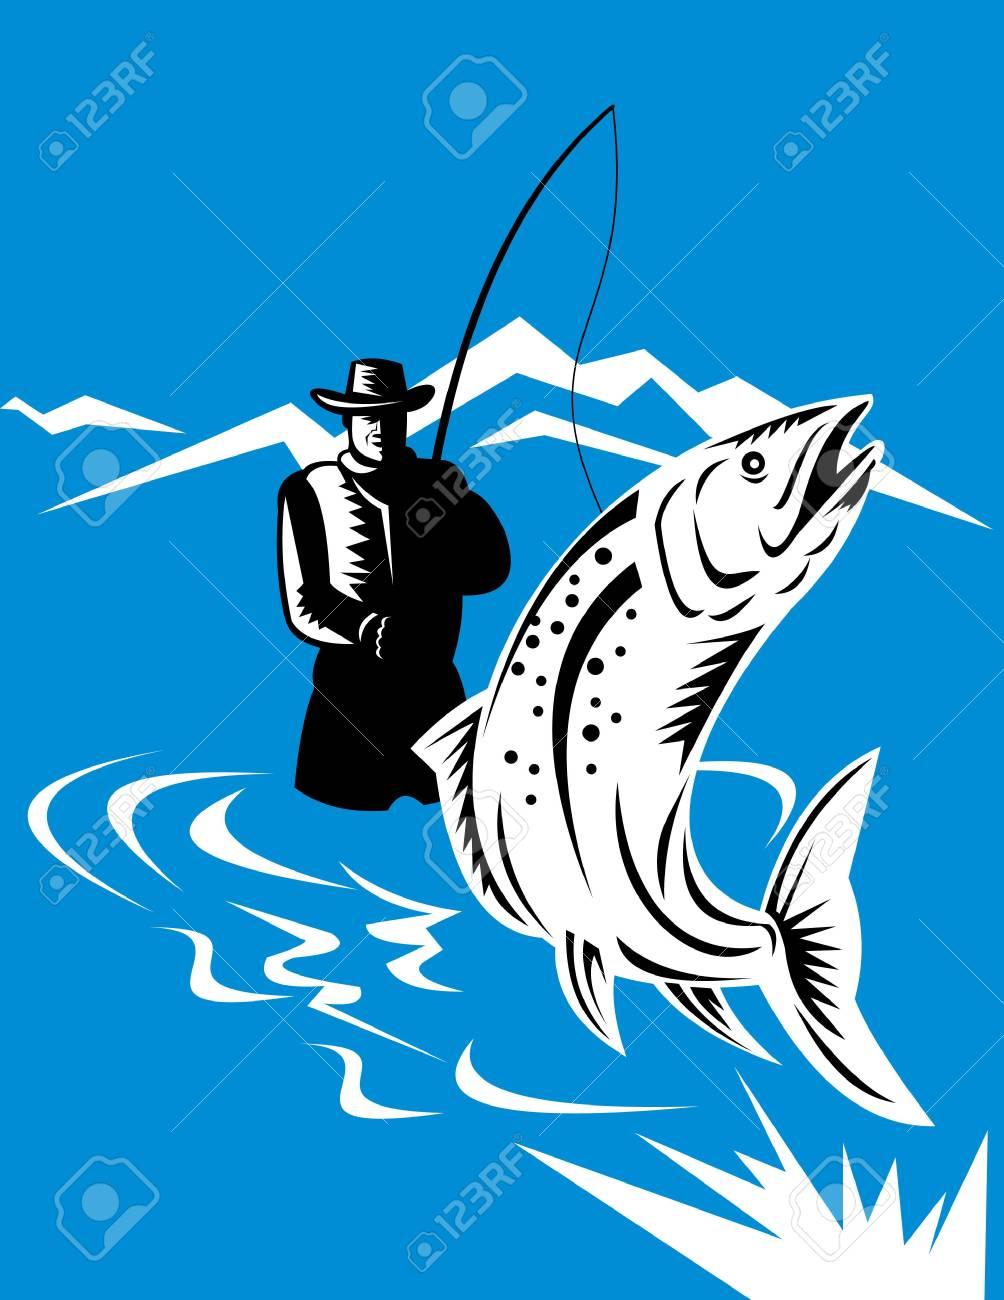 fisherman catching trout Stock Photo - 7046123